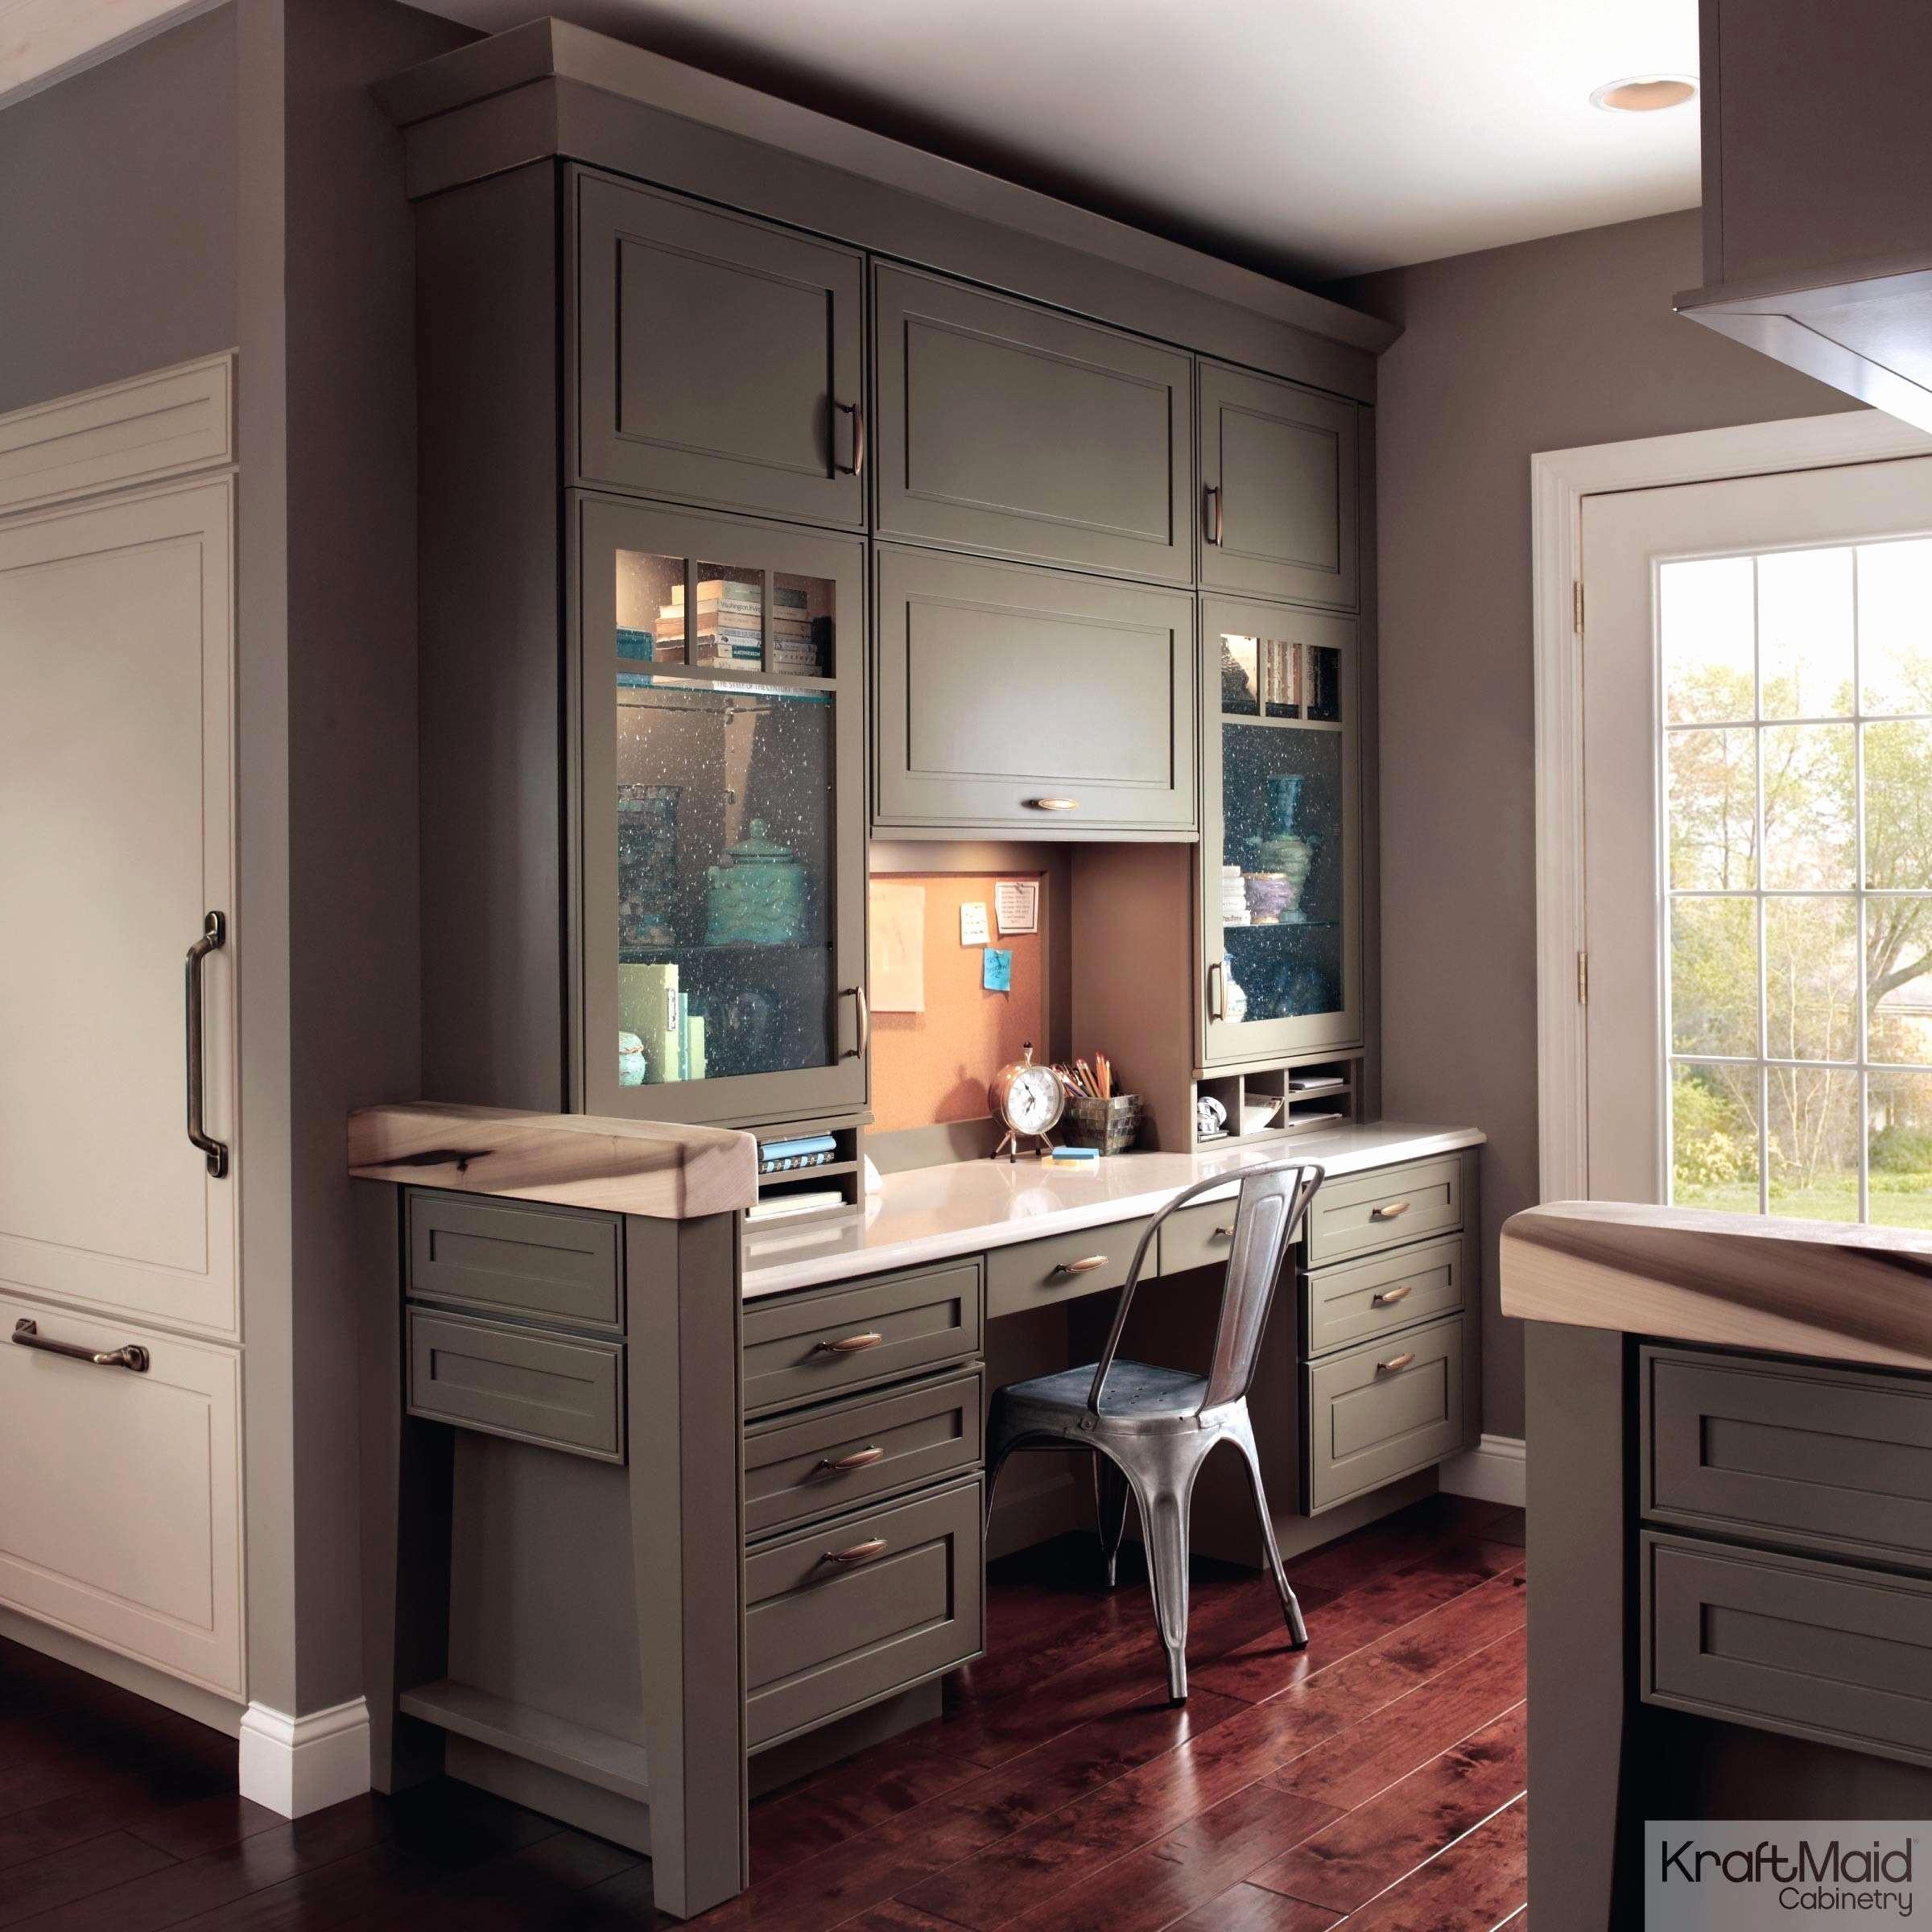 Top Hardwood Floor Colors 2017 Of 18 Inspirational Hardwood Flooring Stock Dizpos Com Inside Hardwood Flooring Fresh Oak Kitchen Cabinets with Hardwood Floors Beautiful Custom Kitchen Pictures Of 18 Inspirational